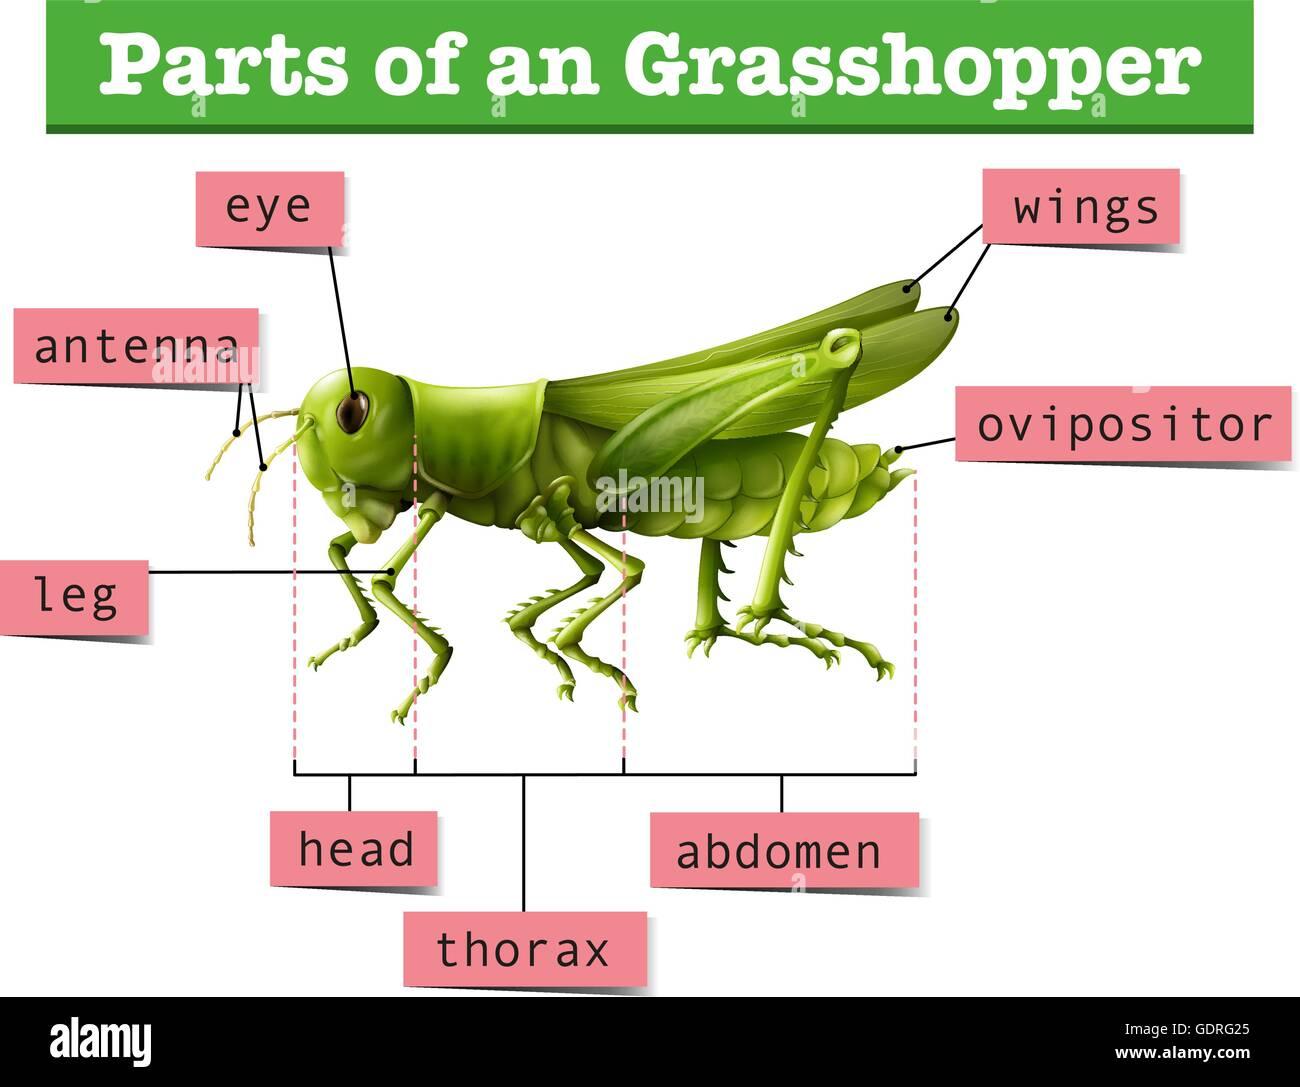 Diagram Showing Different Parts Of Grasshopper